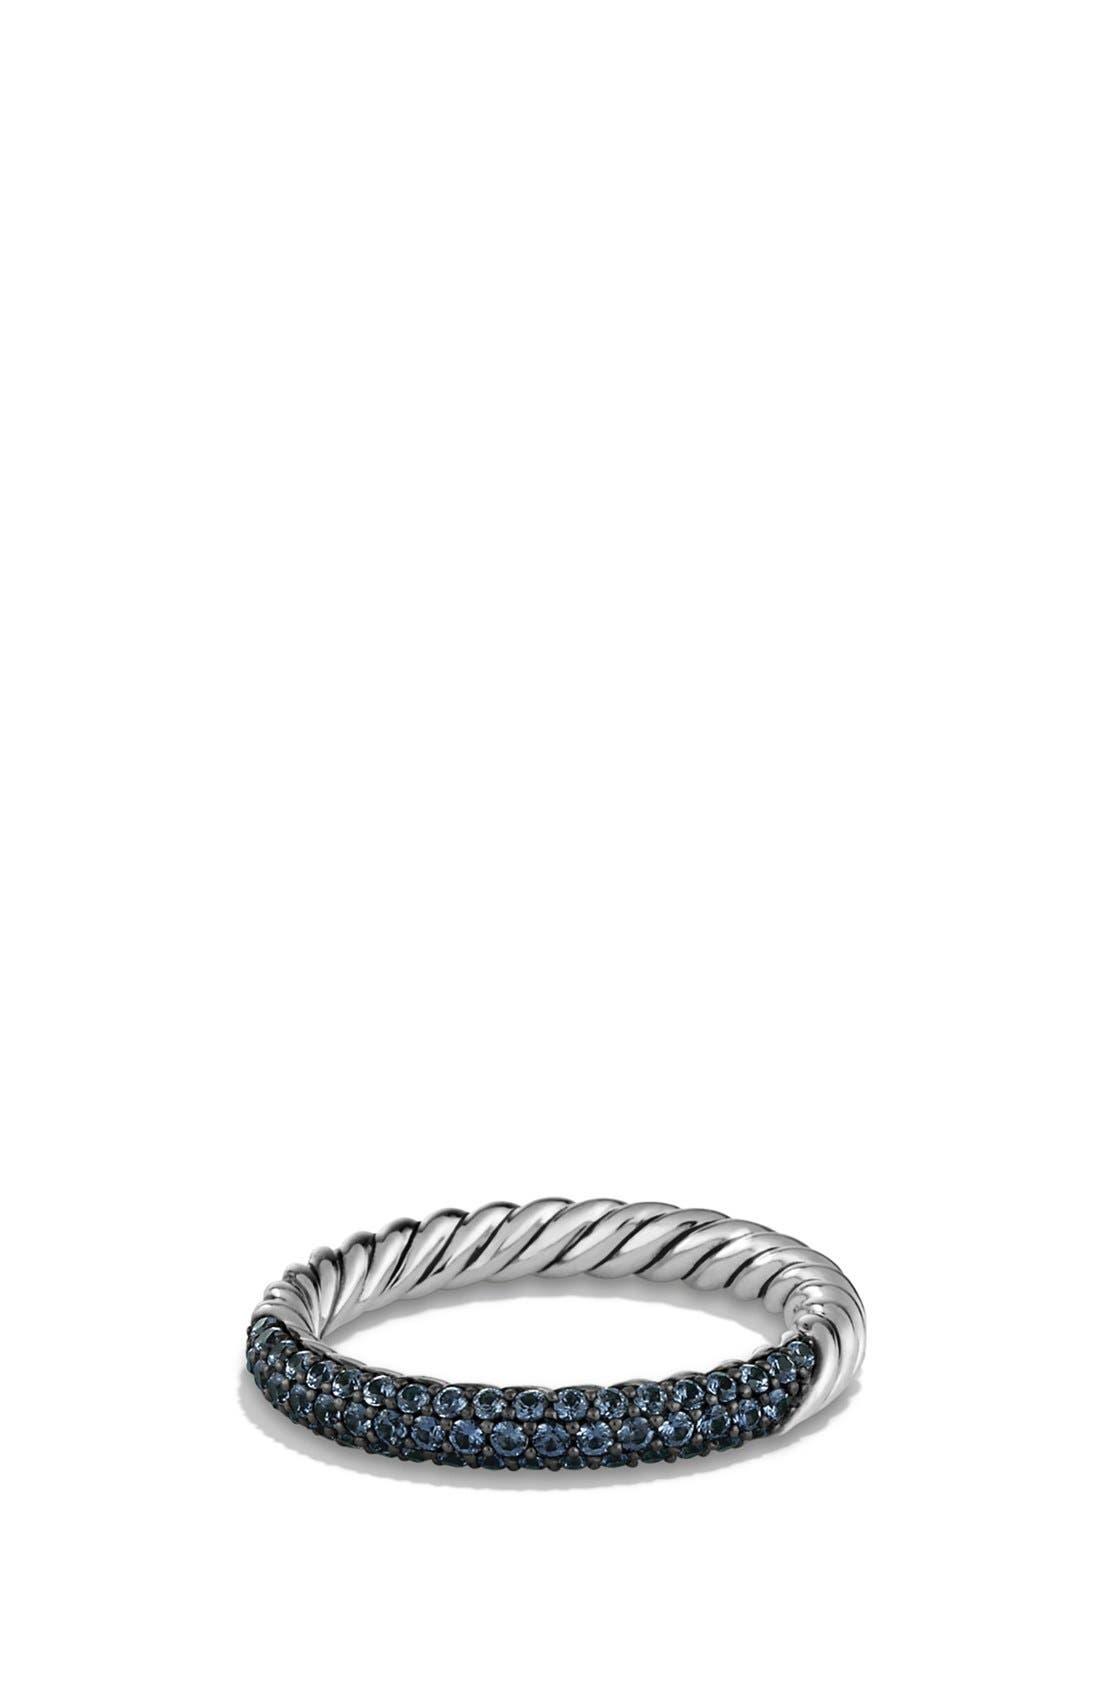 'Petite Pavé' Ring with Sapphires,                             Main thumbnail 1, color,                             BLUE SAPHIRE